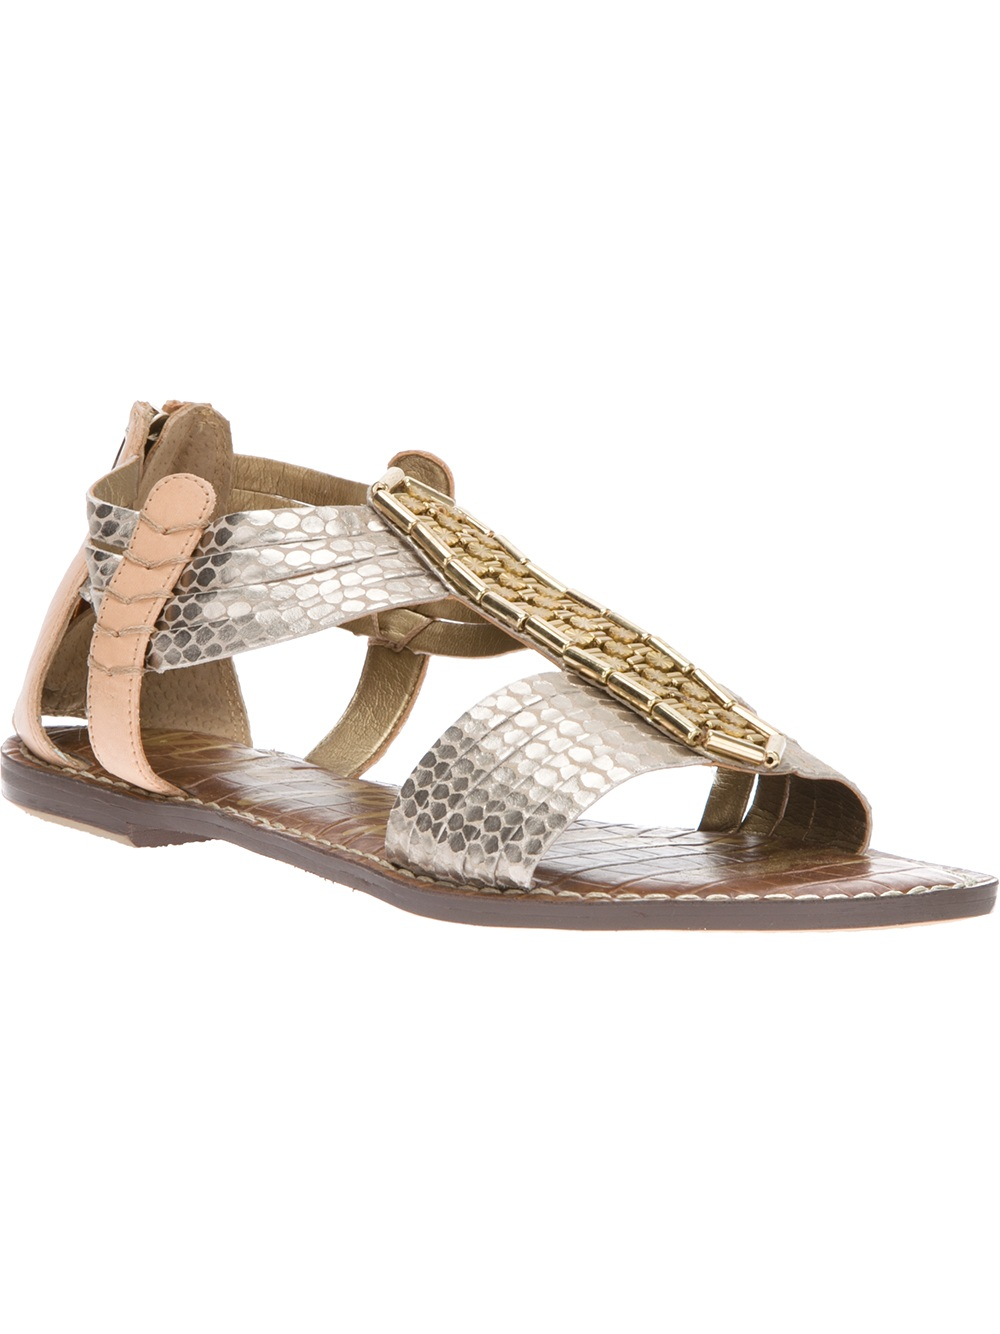 Lyst Sam Edelman Gatsby Sandals In Metallic